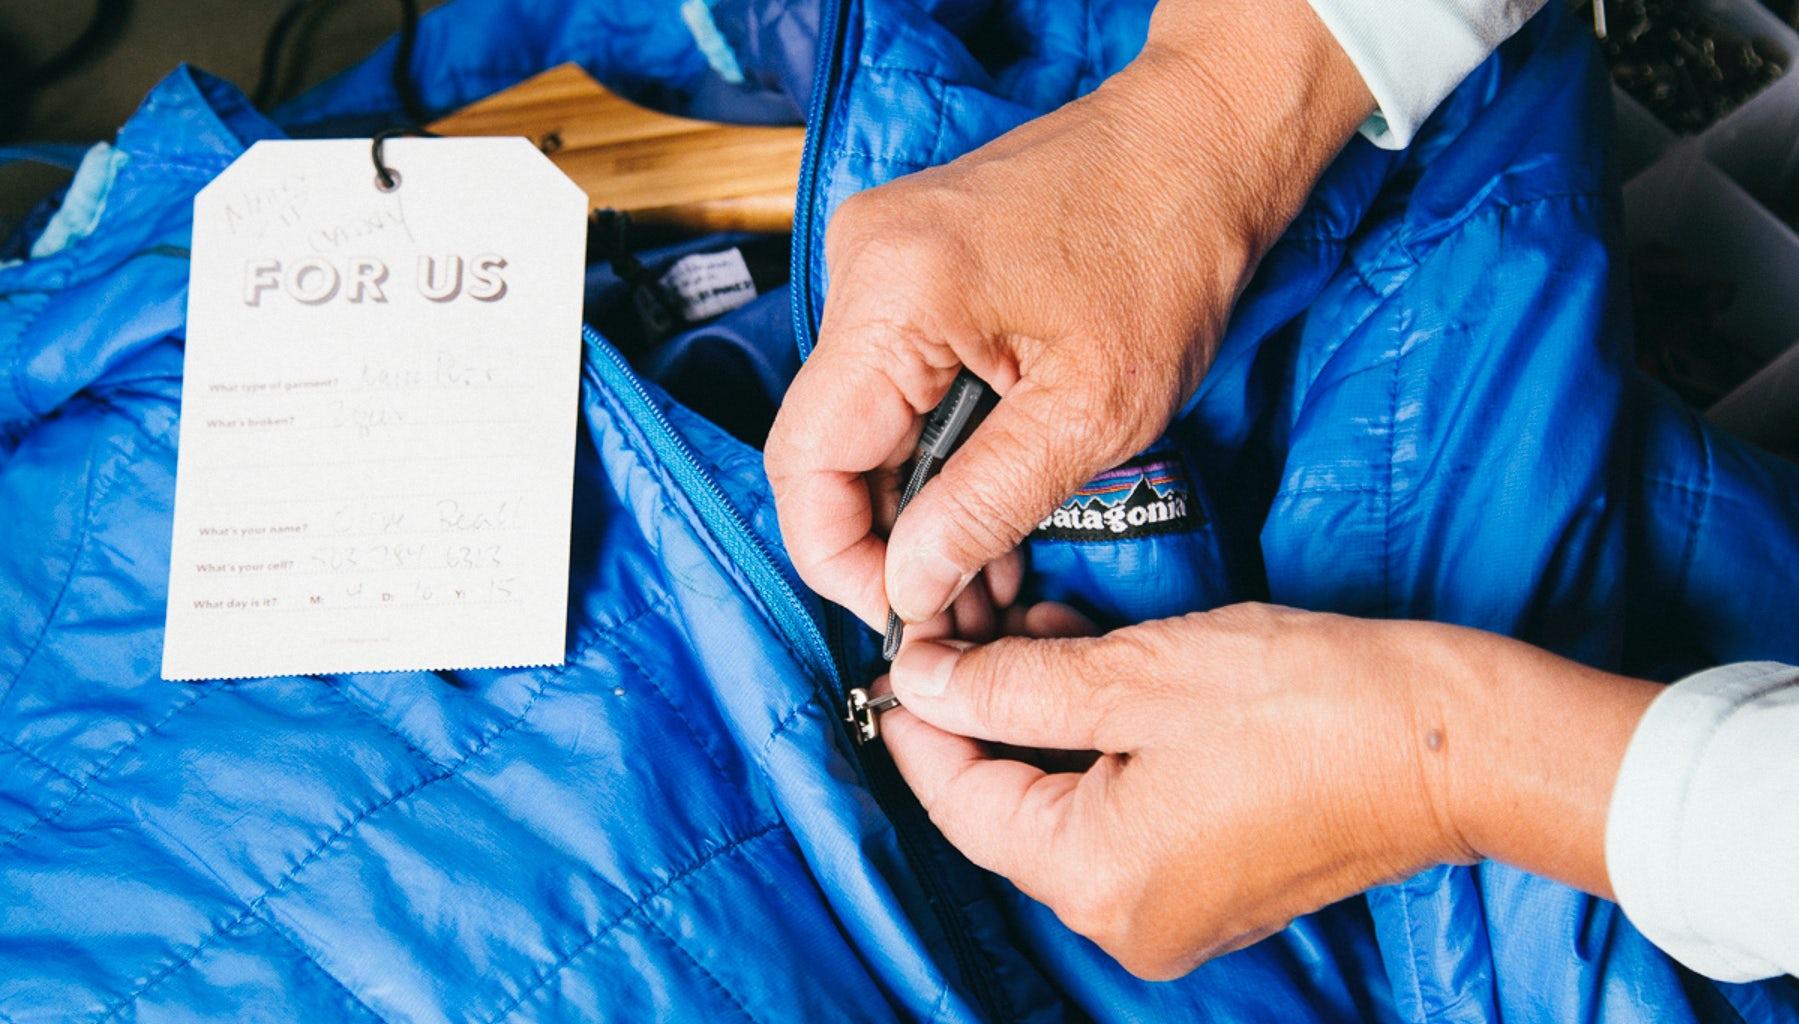 Patagonia Worn Wear | Source: Courtesy